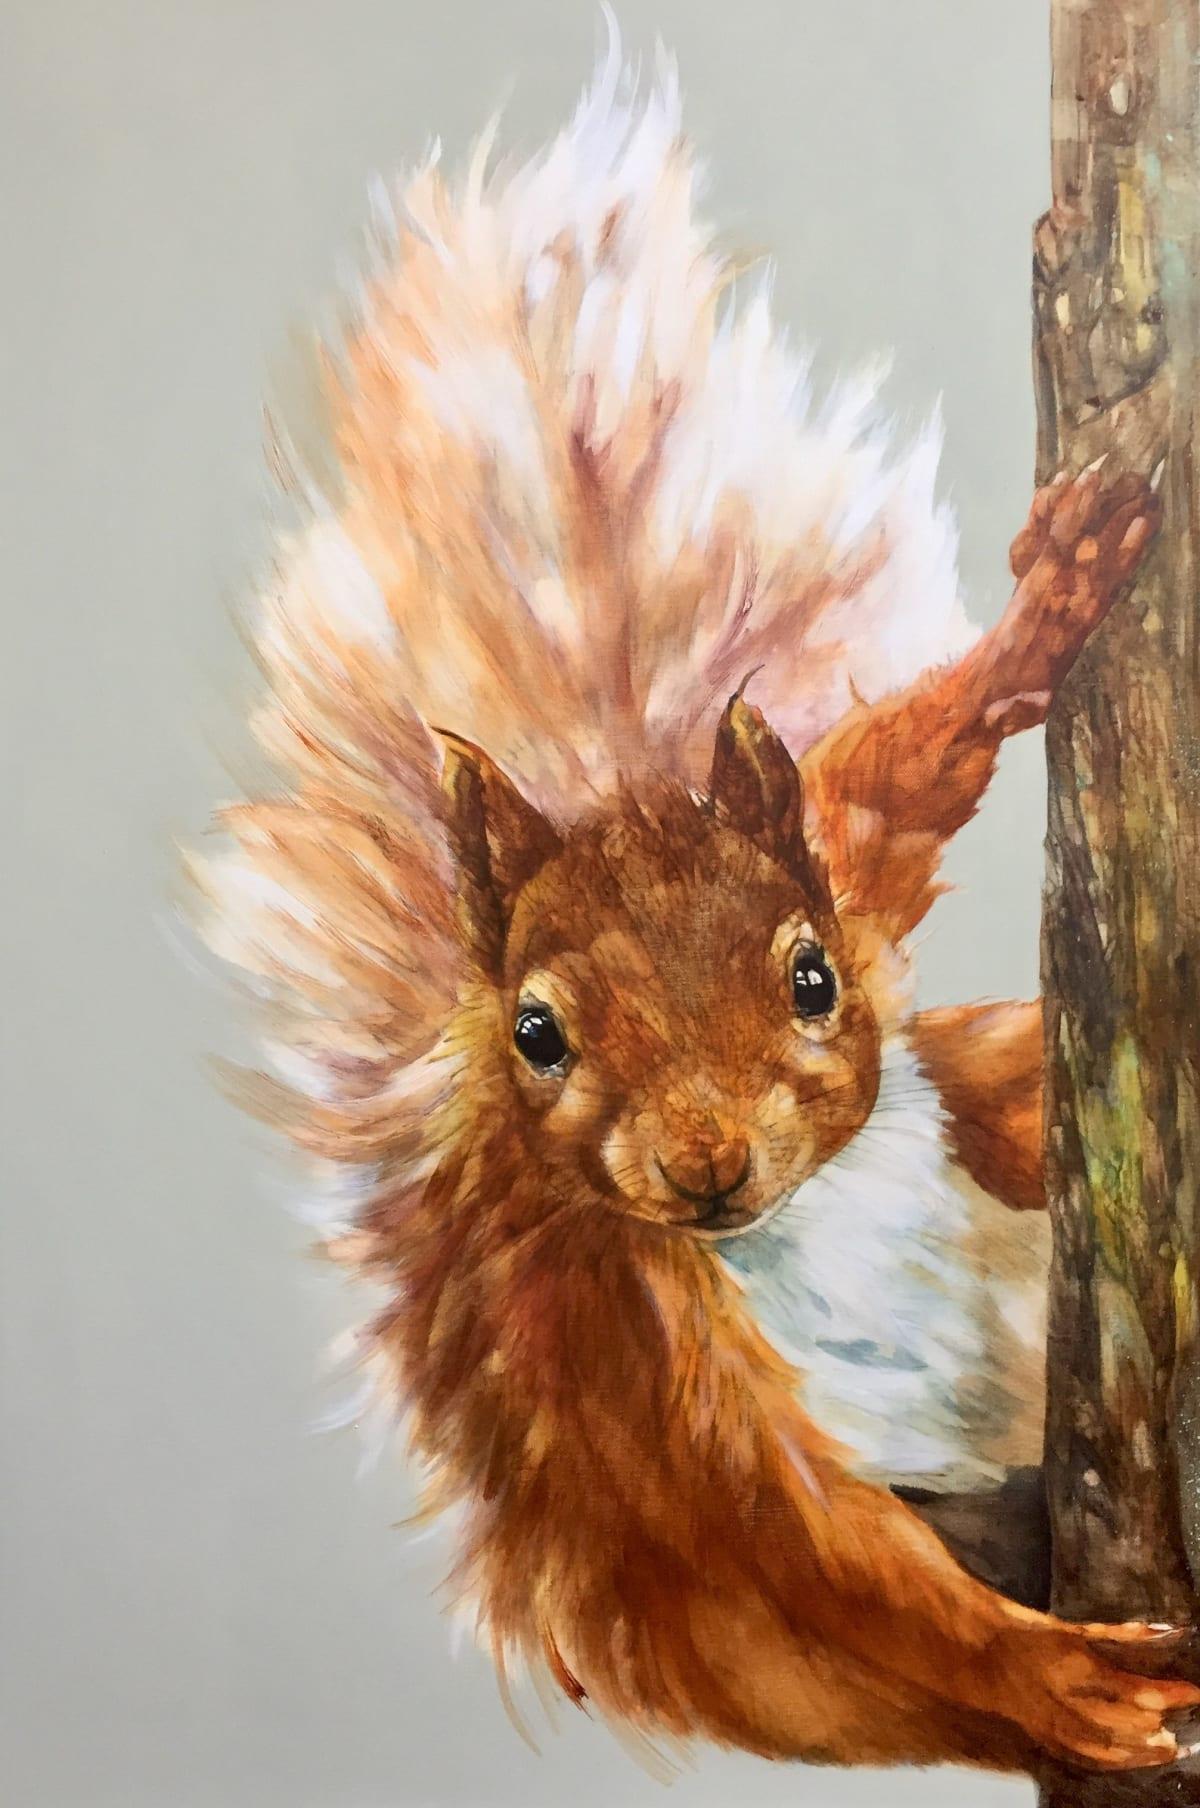 Paula Vize BIRKHALL VISITOR Acrylic on box canvas 24 x 36 in. 60.96 x 91.44 cm